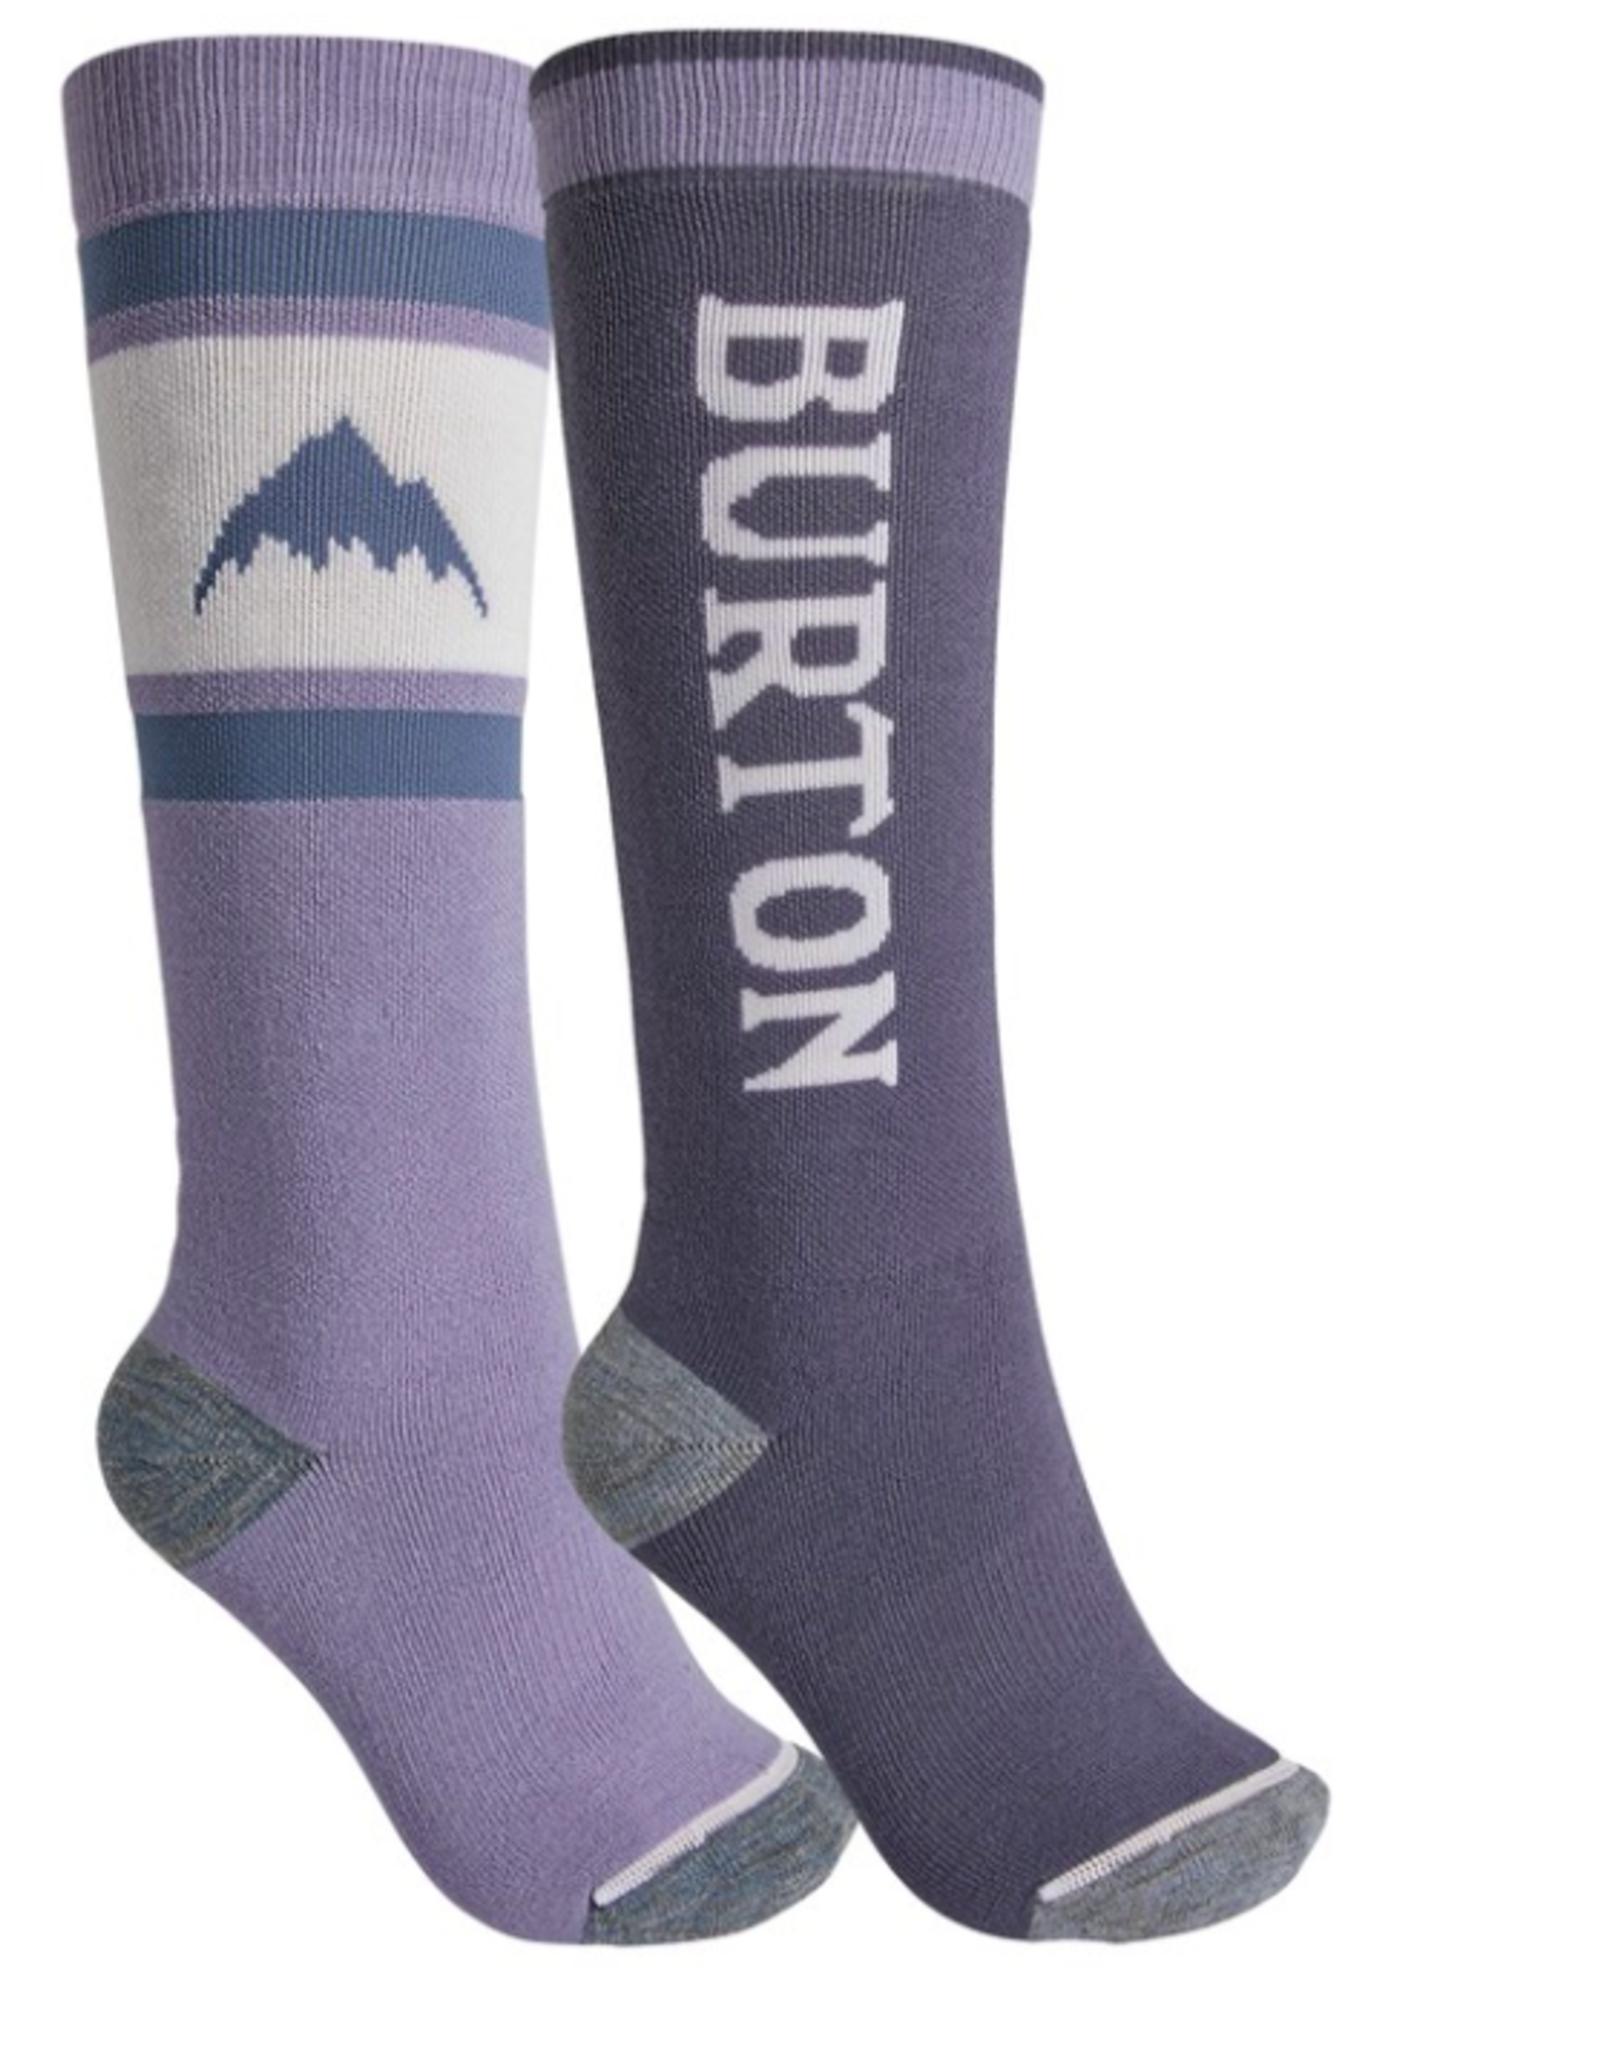 BURTON Burton Women's Weekend Midweight Socks 2 Pack Foxglove Violet/Folkstone Gray 2022